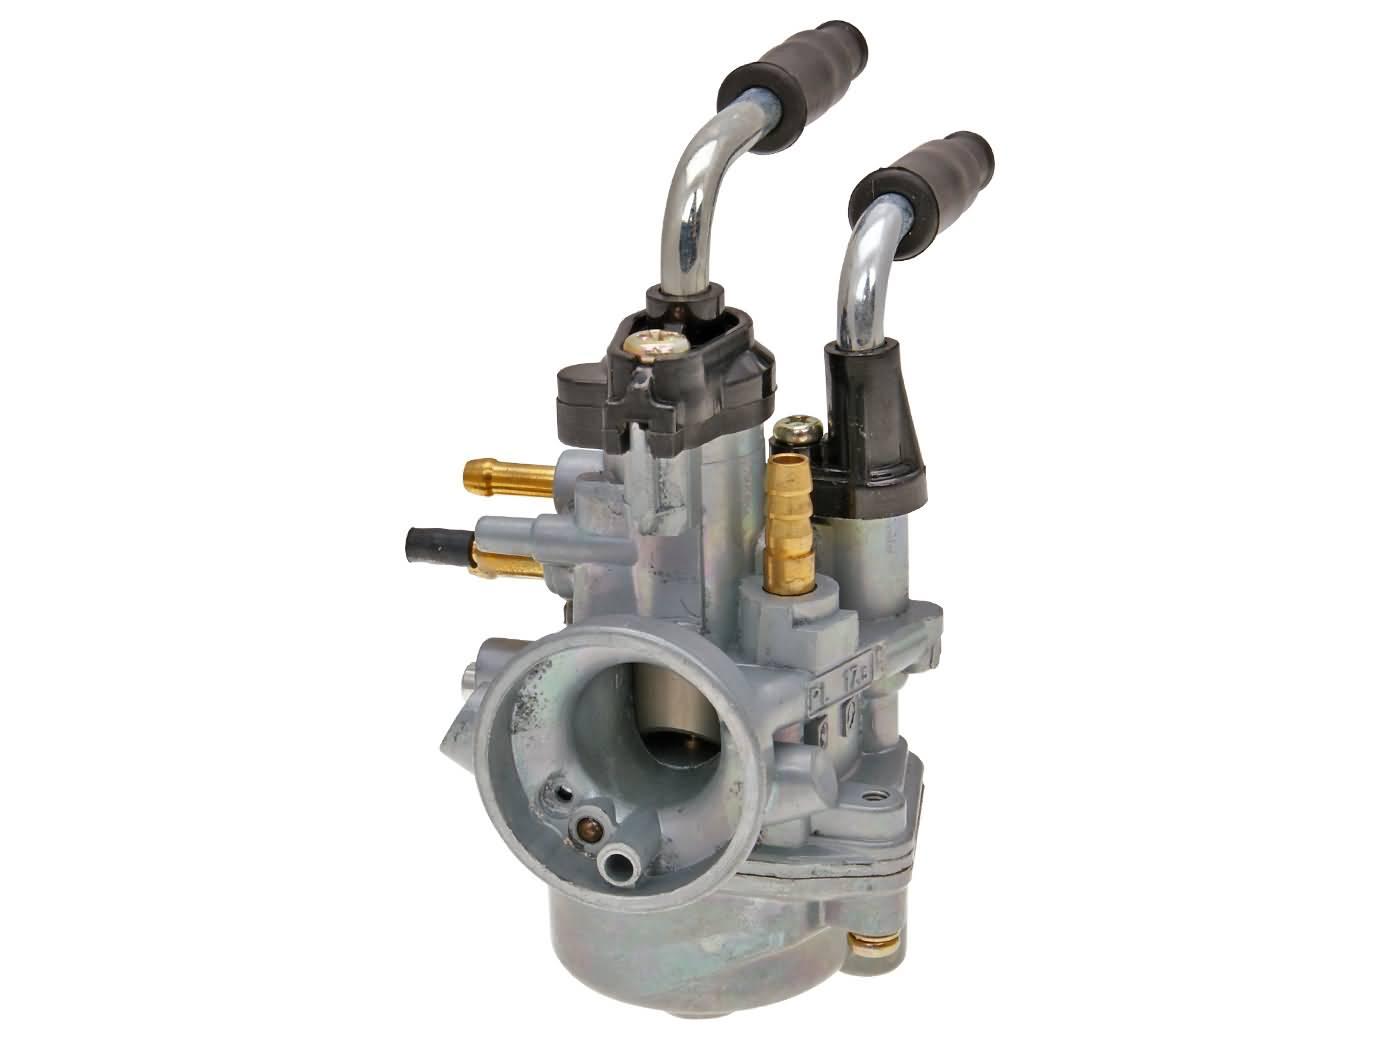 Minarell Motor für MBK Nitro 50 Cat Vergaser Naraku 17,5mm mir M-Choke f